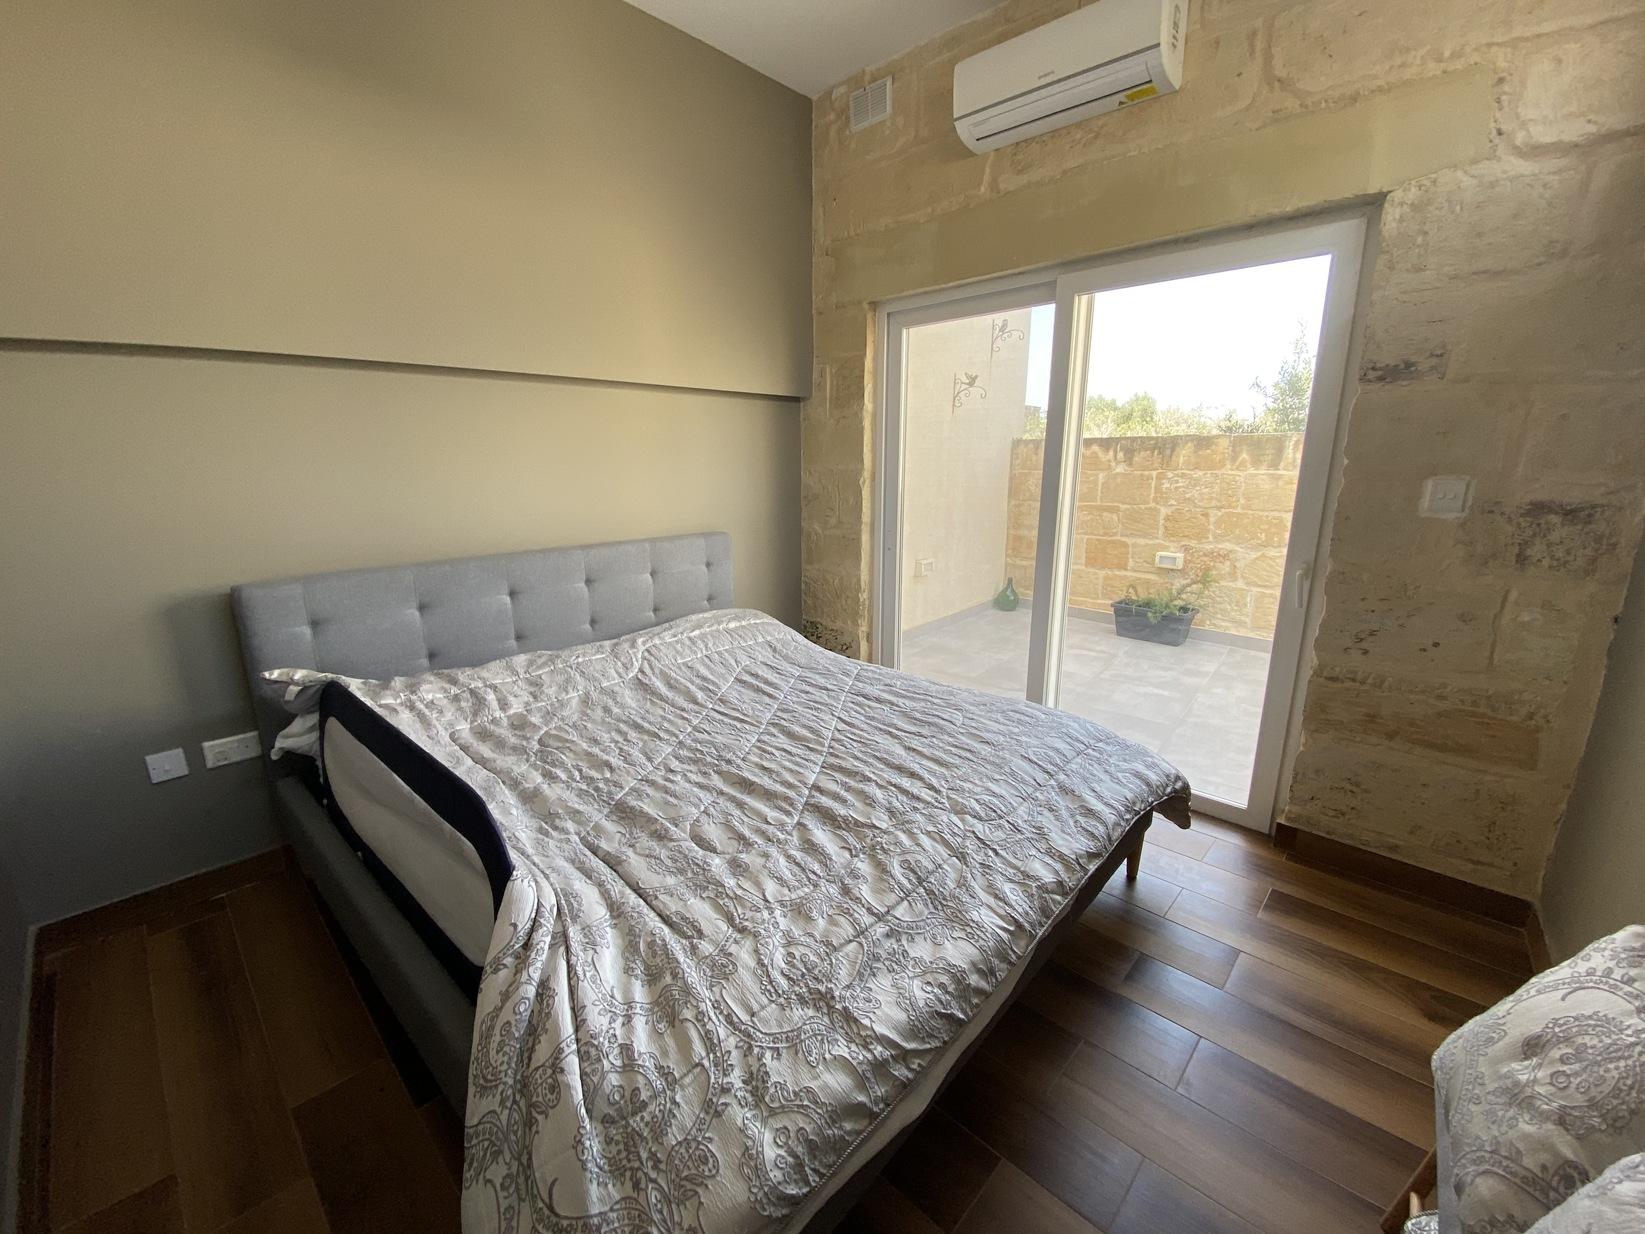 3 bed Town House For Rent in Lija, Lija - thumb 10